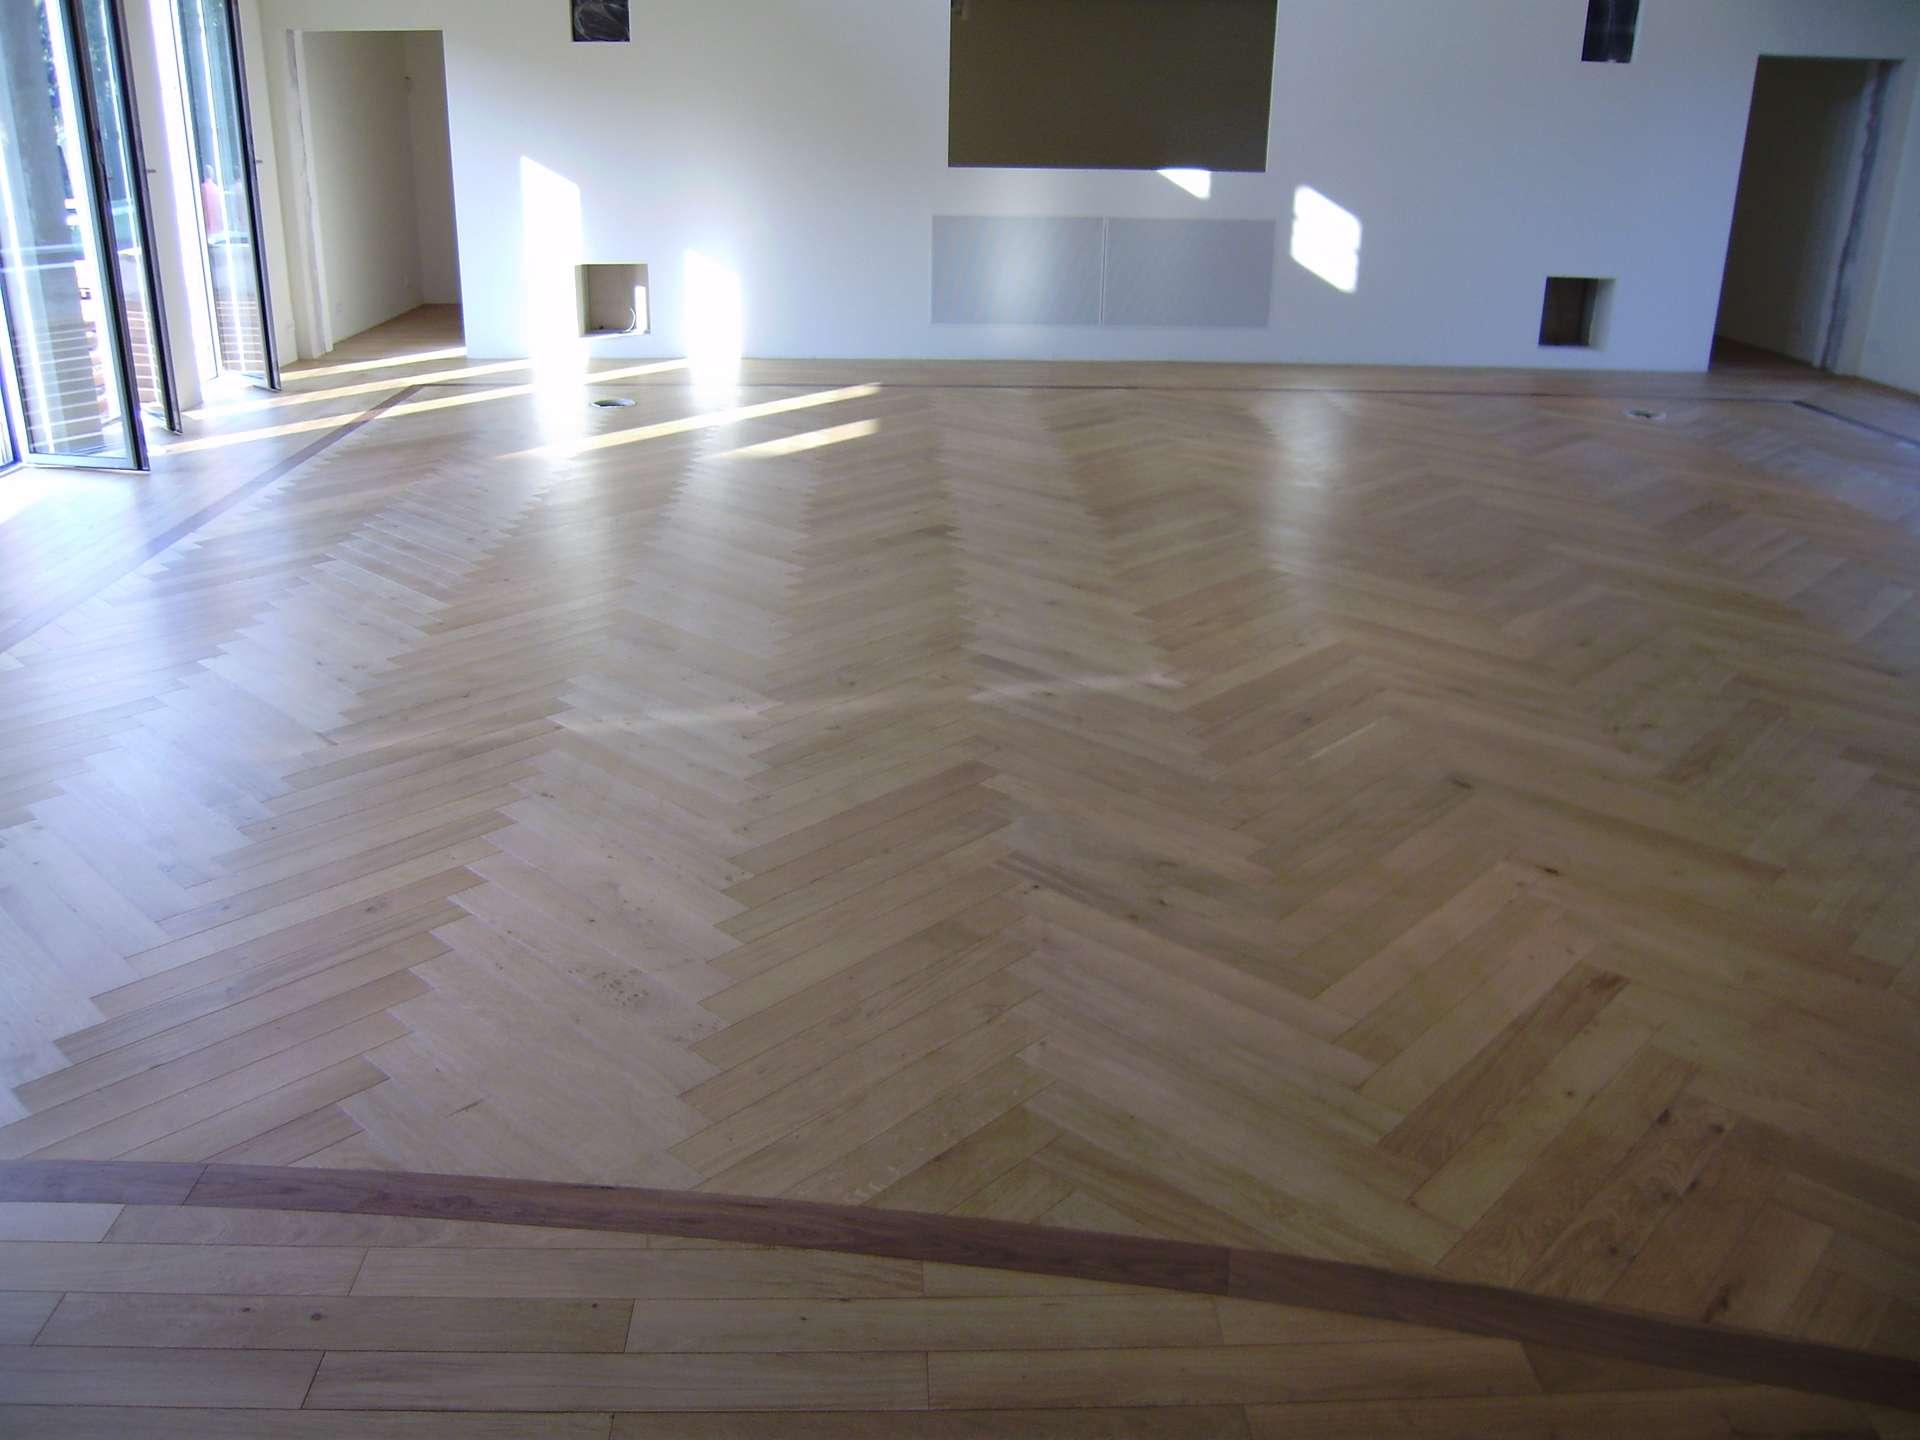 Parkett Duisburg referenzen parkett wiegrink floor object design